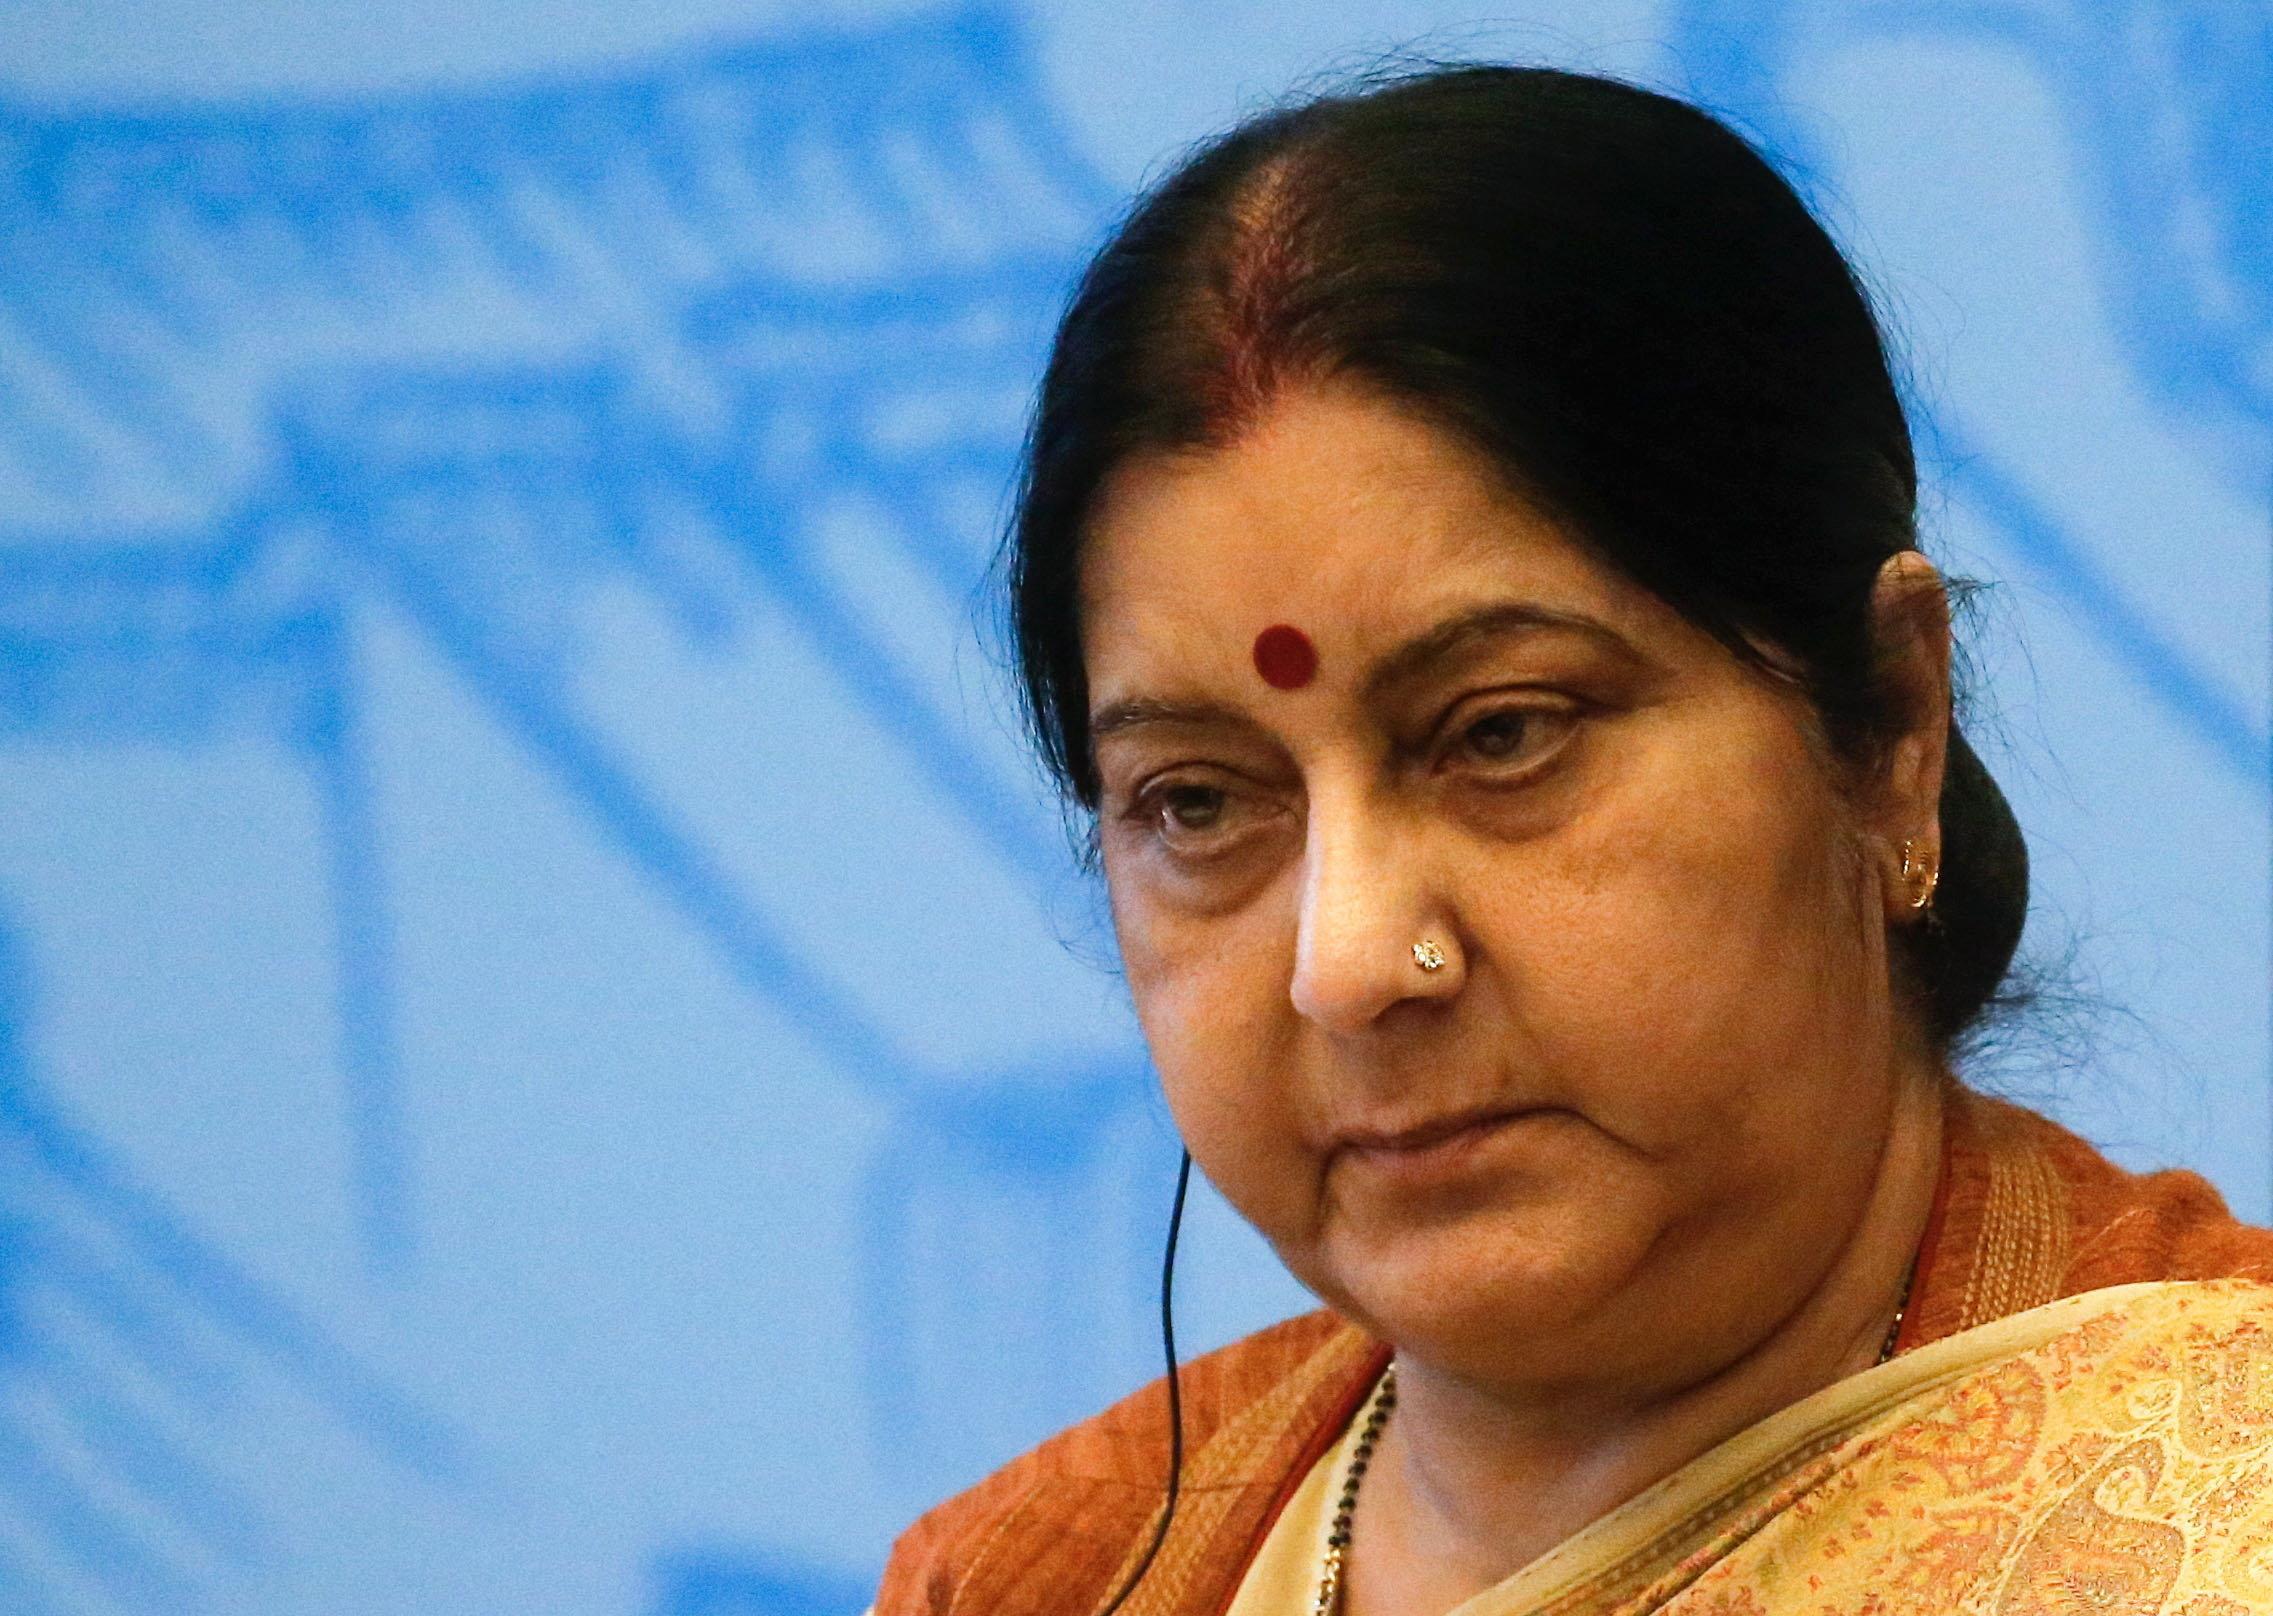 Sushma Swaraj Seeks Help To Reach Family Of UN Consultant Killed In Ethiopia